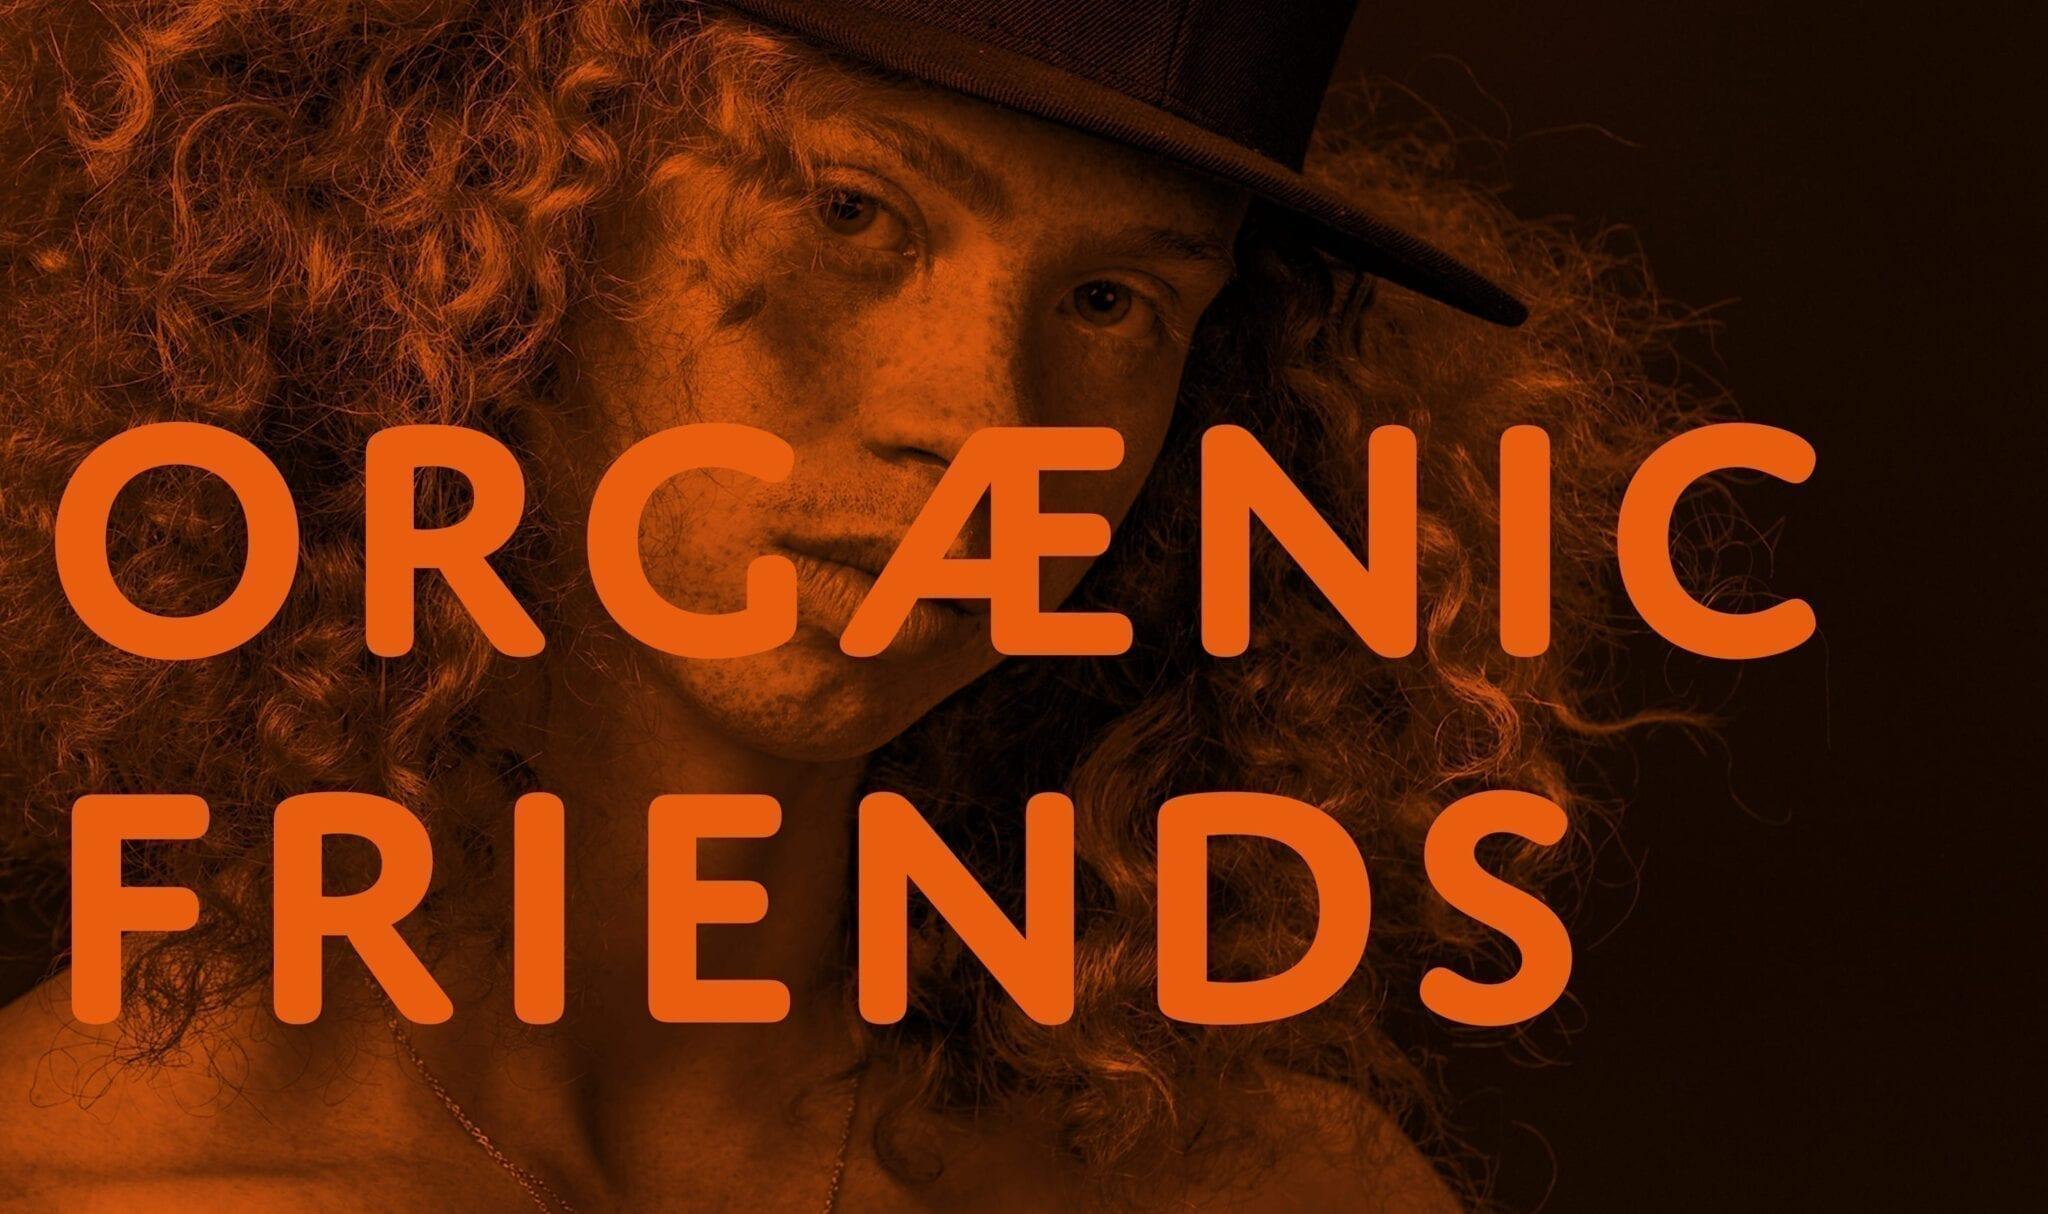 Orgænic Friends Model